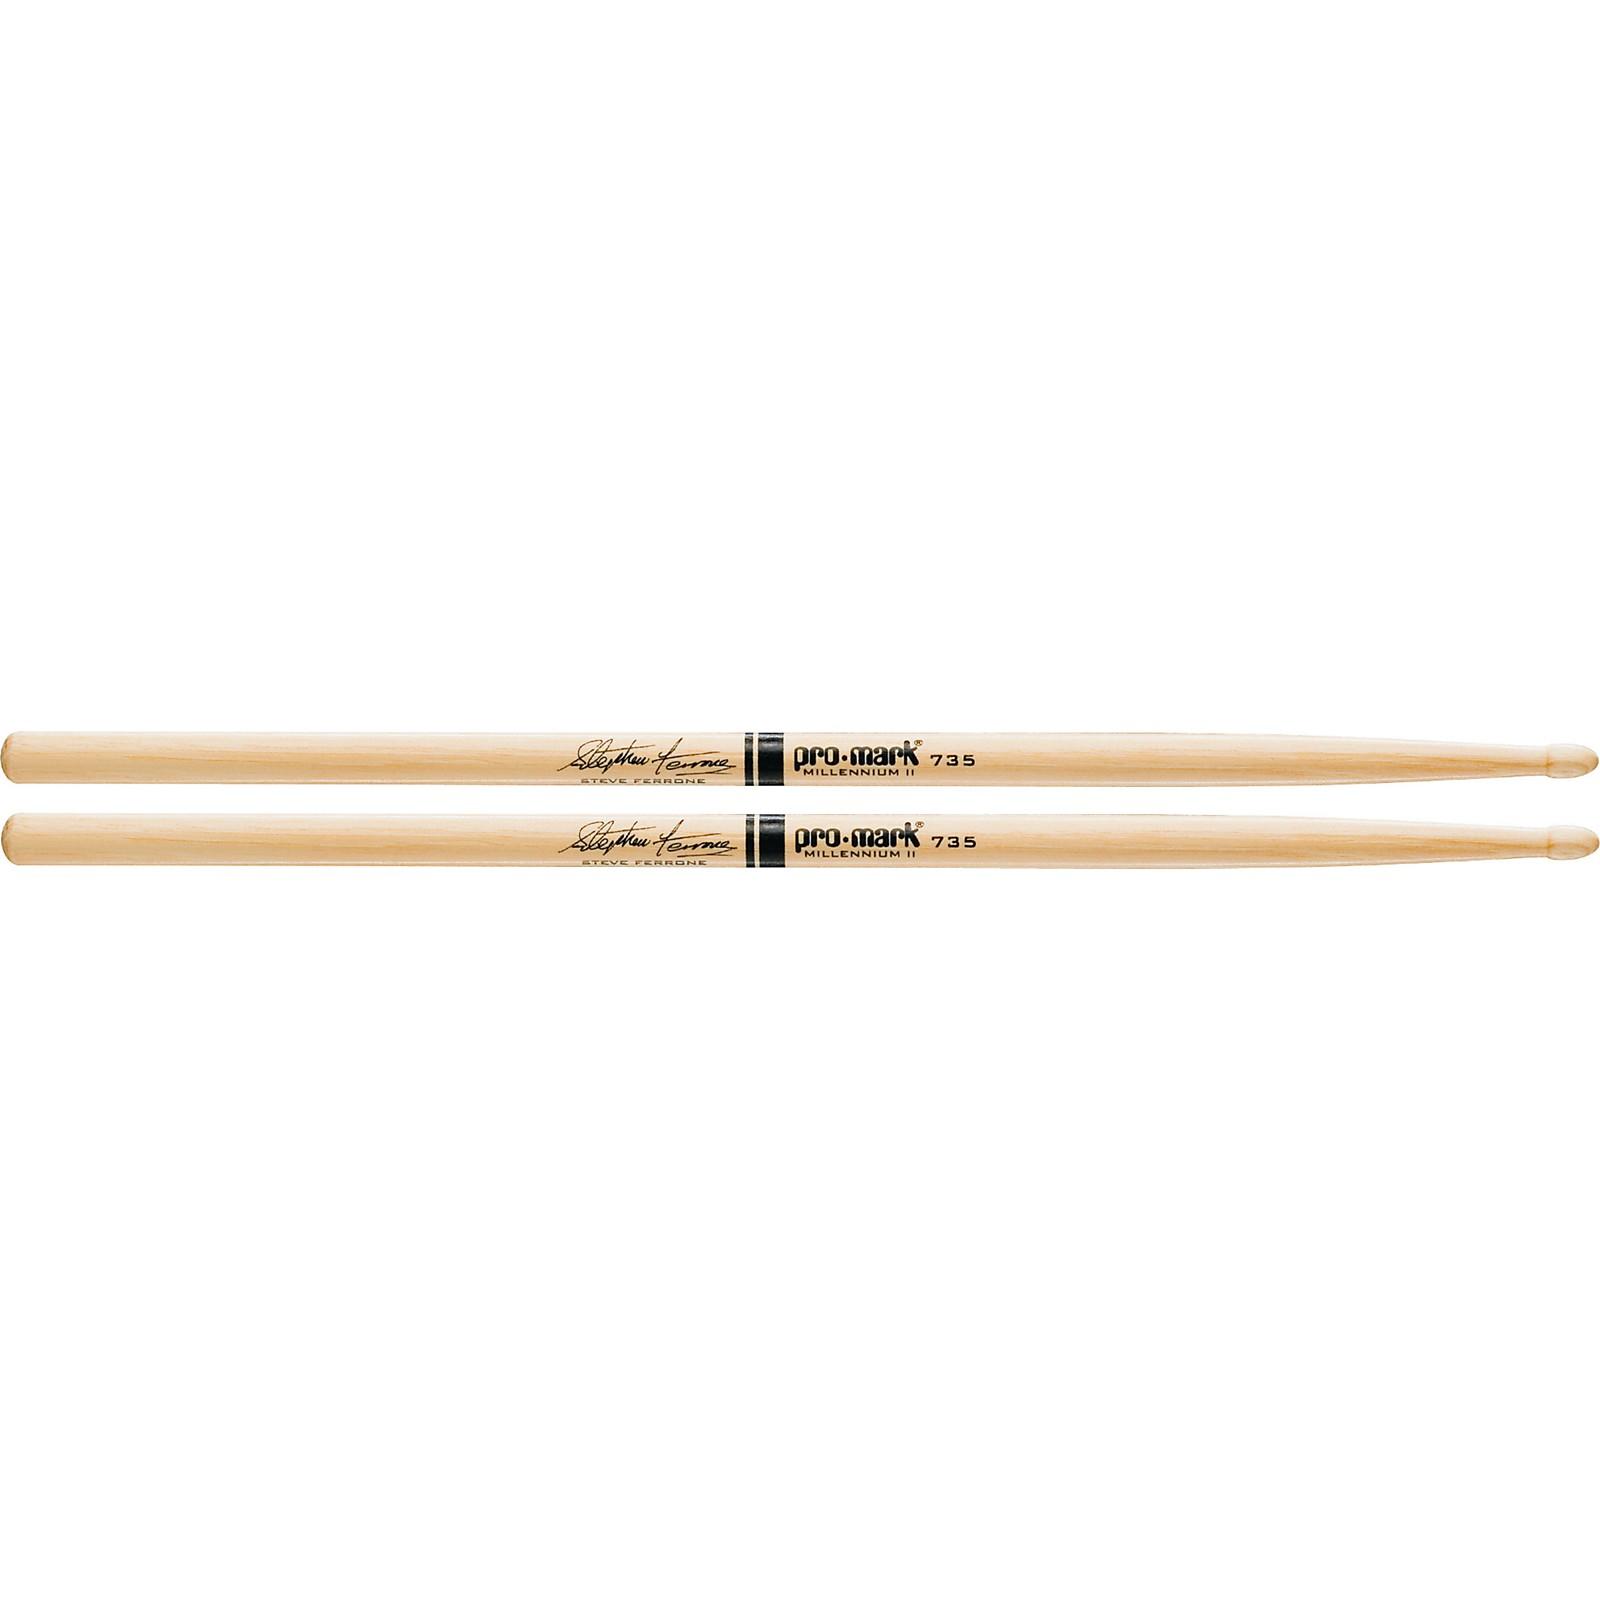 Promark Steve Ferrone Autograph Series Drum Sticks